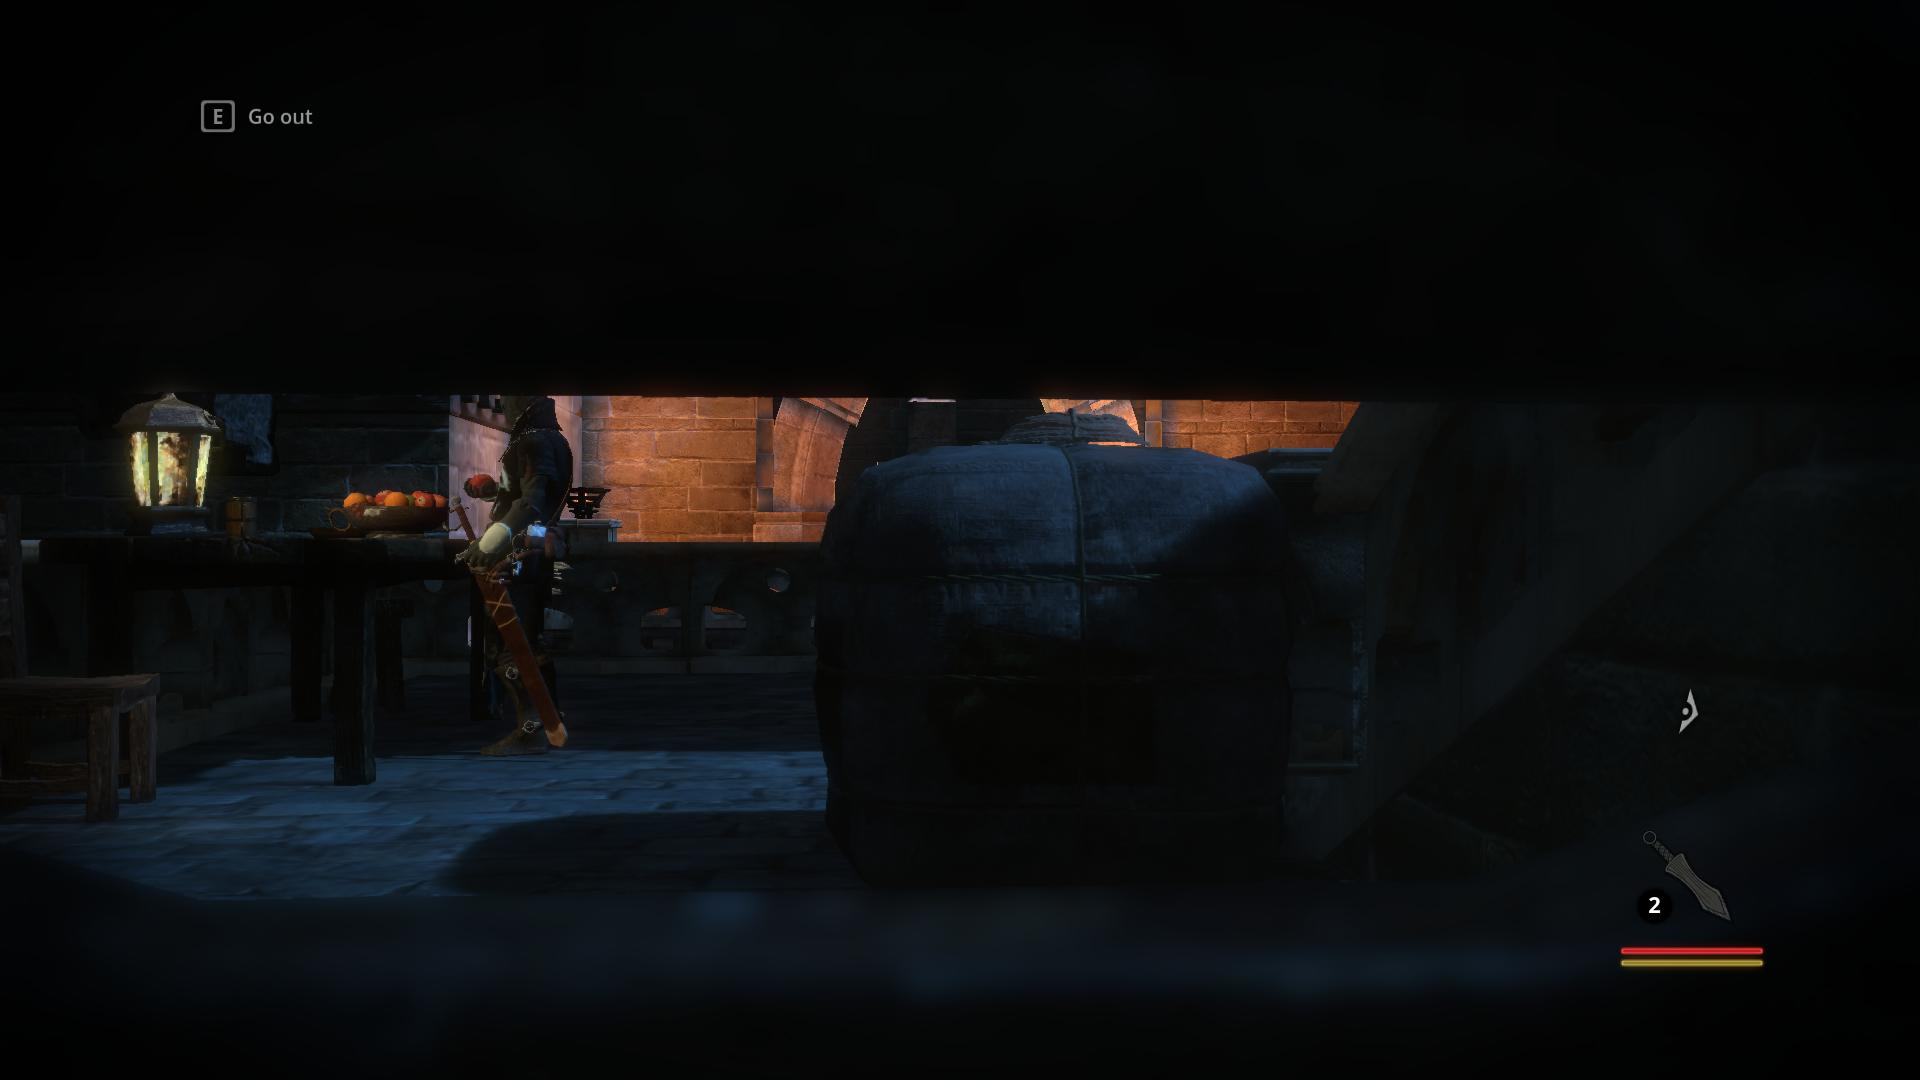 Recenze Styx: Master of Shadows - Goblin na lovu 9631